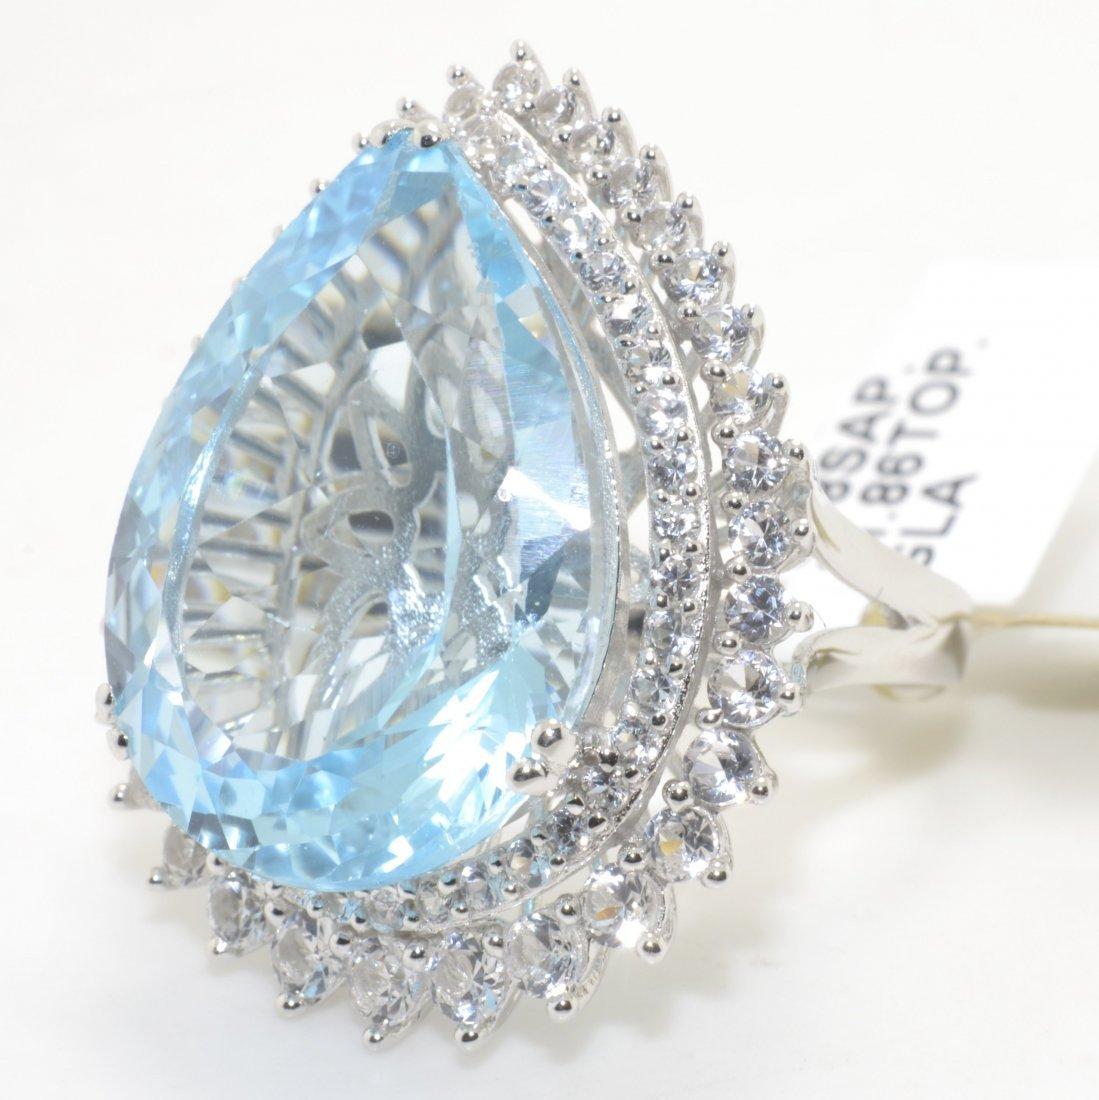 Topaz & White Sapphire Ring Appraised Value: $2,770